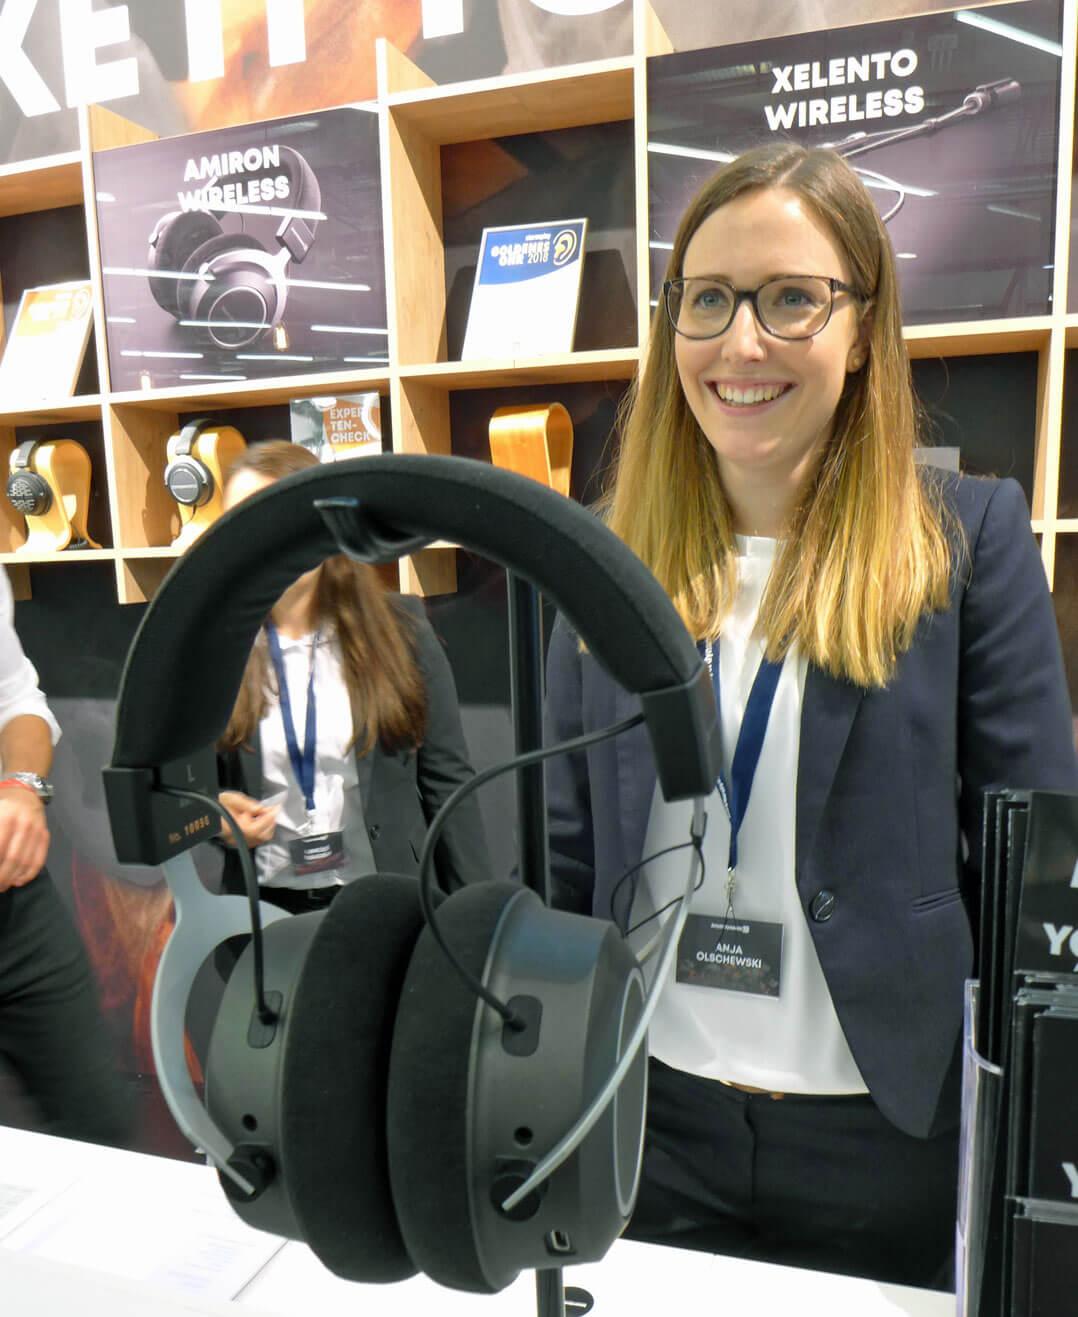 Beyerdynamic Amiron Wireless [mit Anja Olschewski, Head of Marketing]